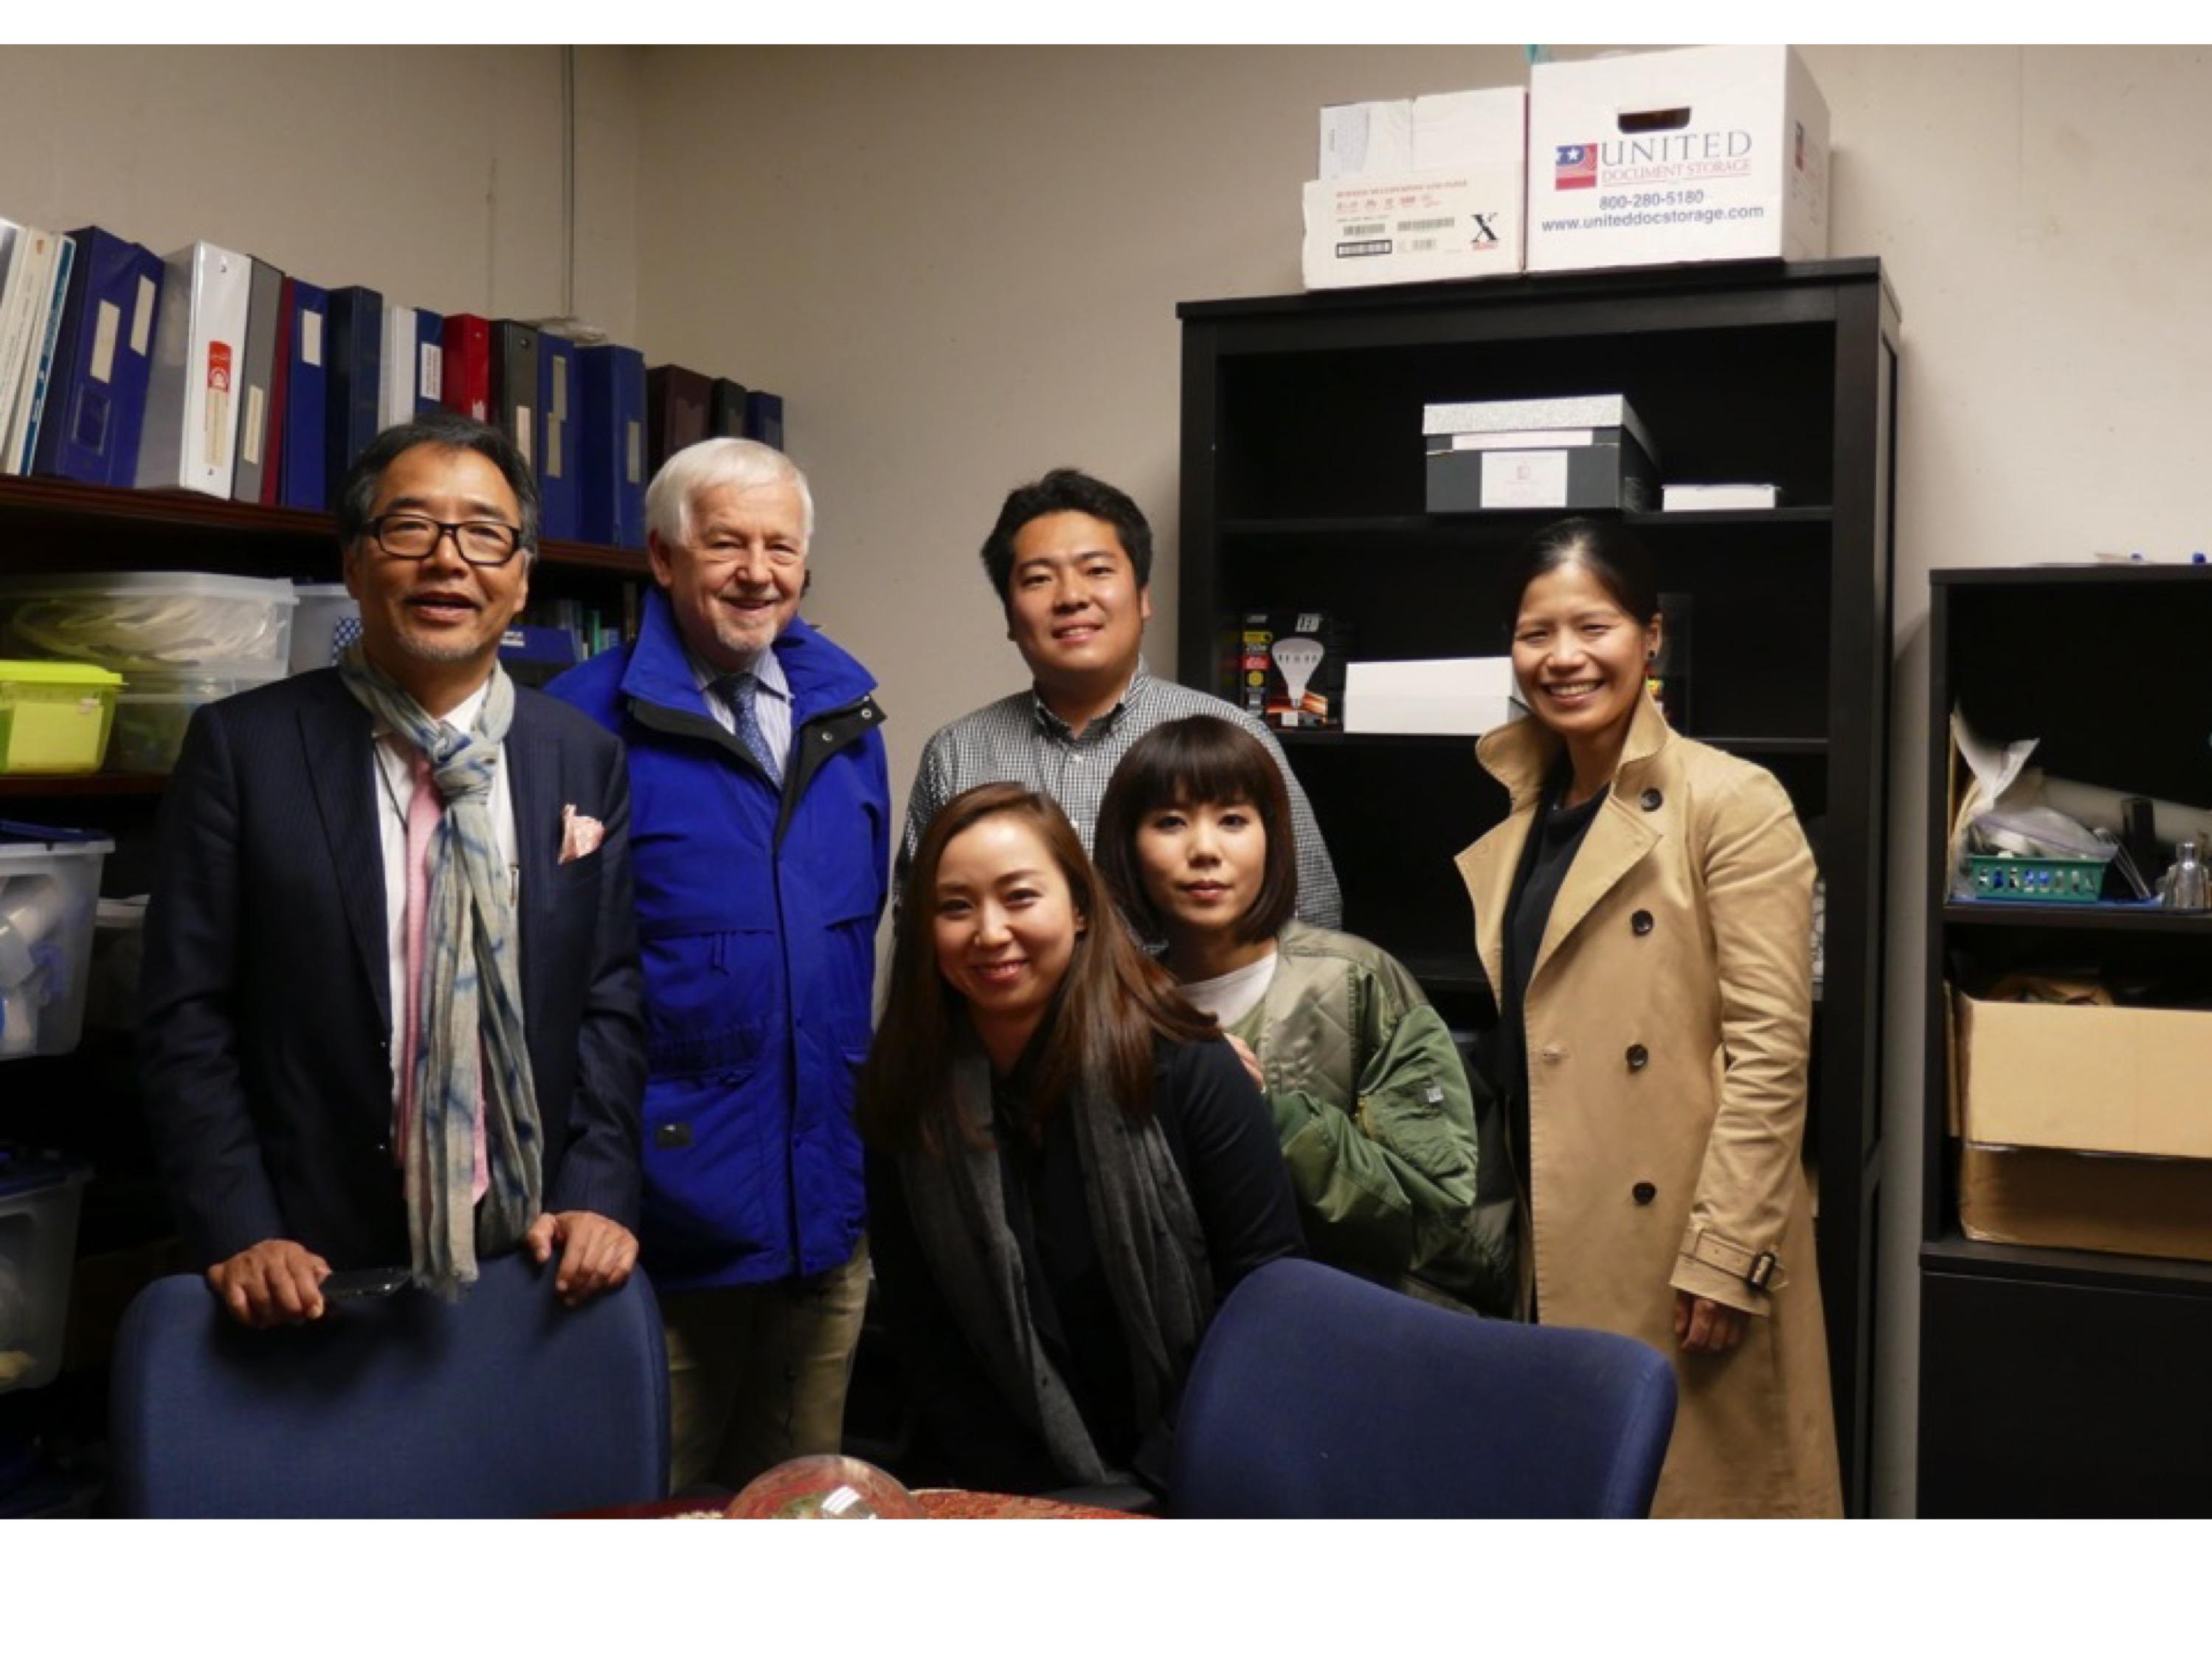 University of Southern CaliforniaのGlenn T. Clark先生とミーティングを行いました